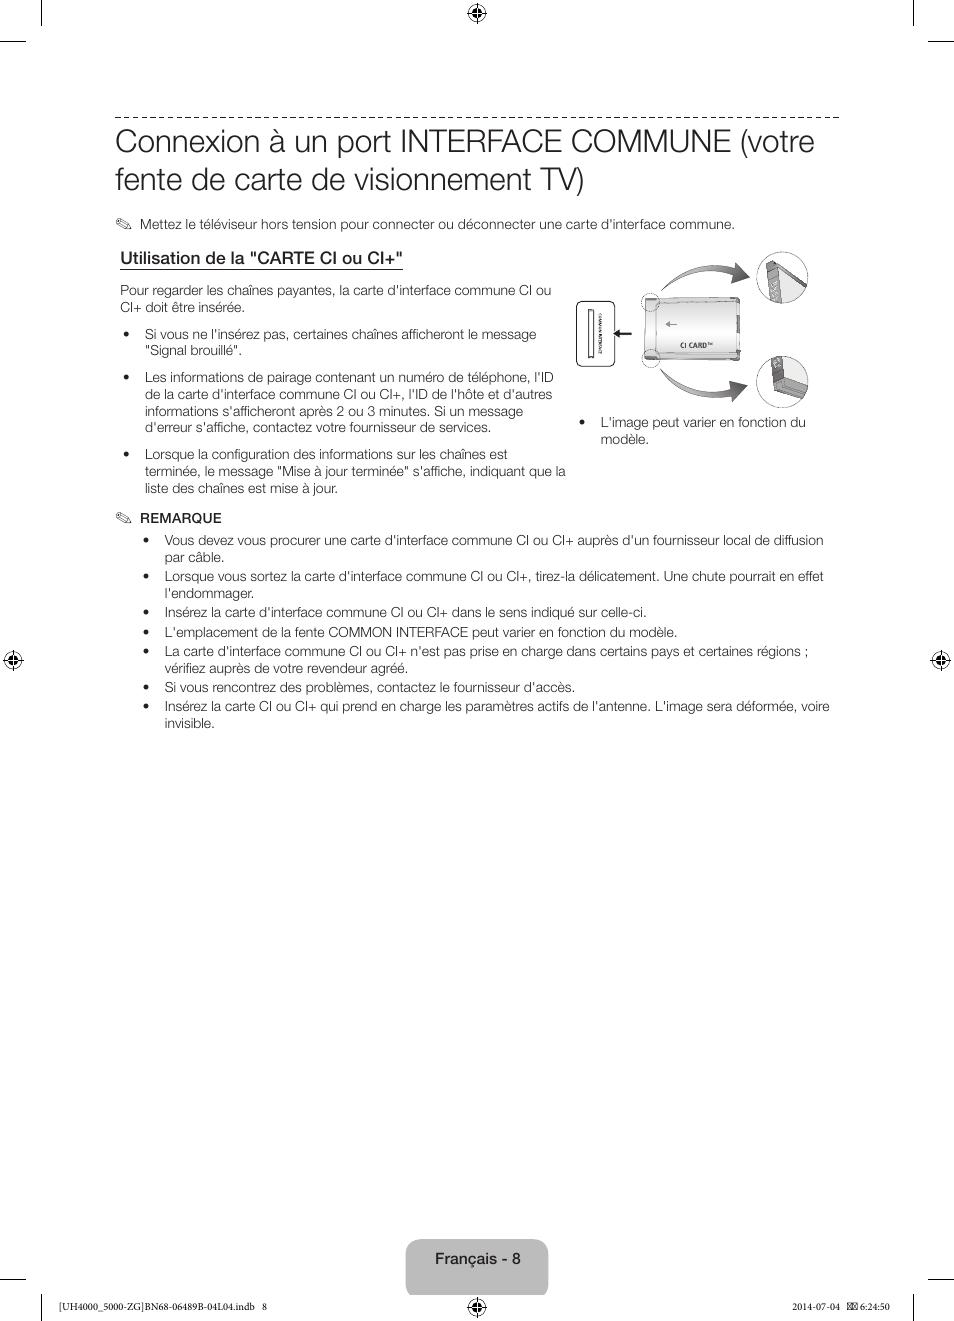 samsung ue48h5090as user manual page 52 89 original mode rh manualsdir com samsung s2 manual download samsung s2 manual